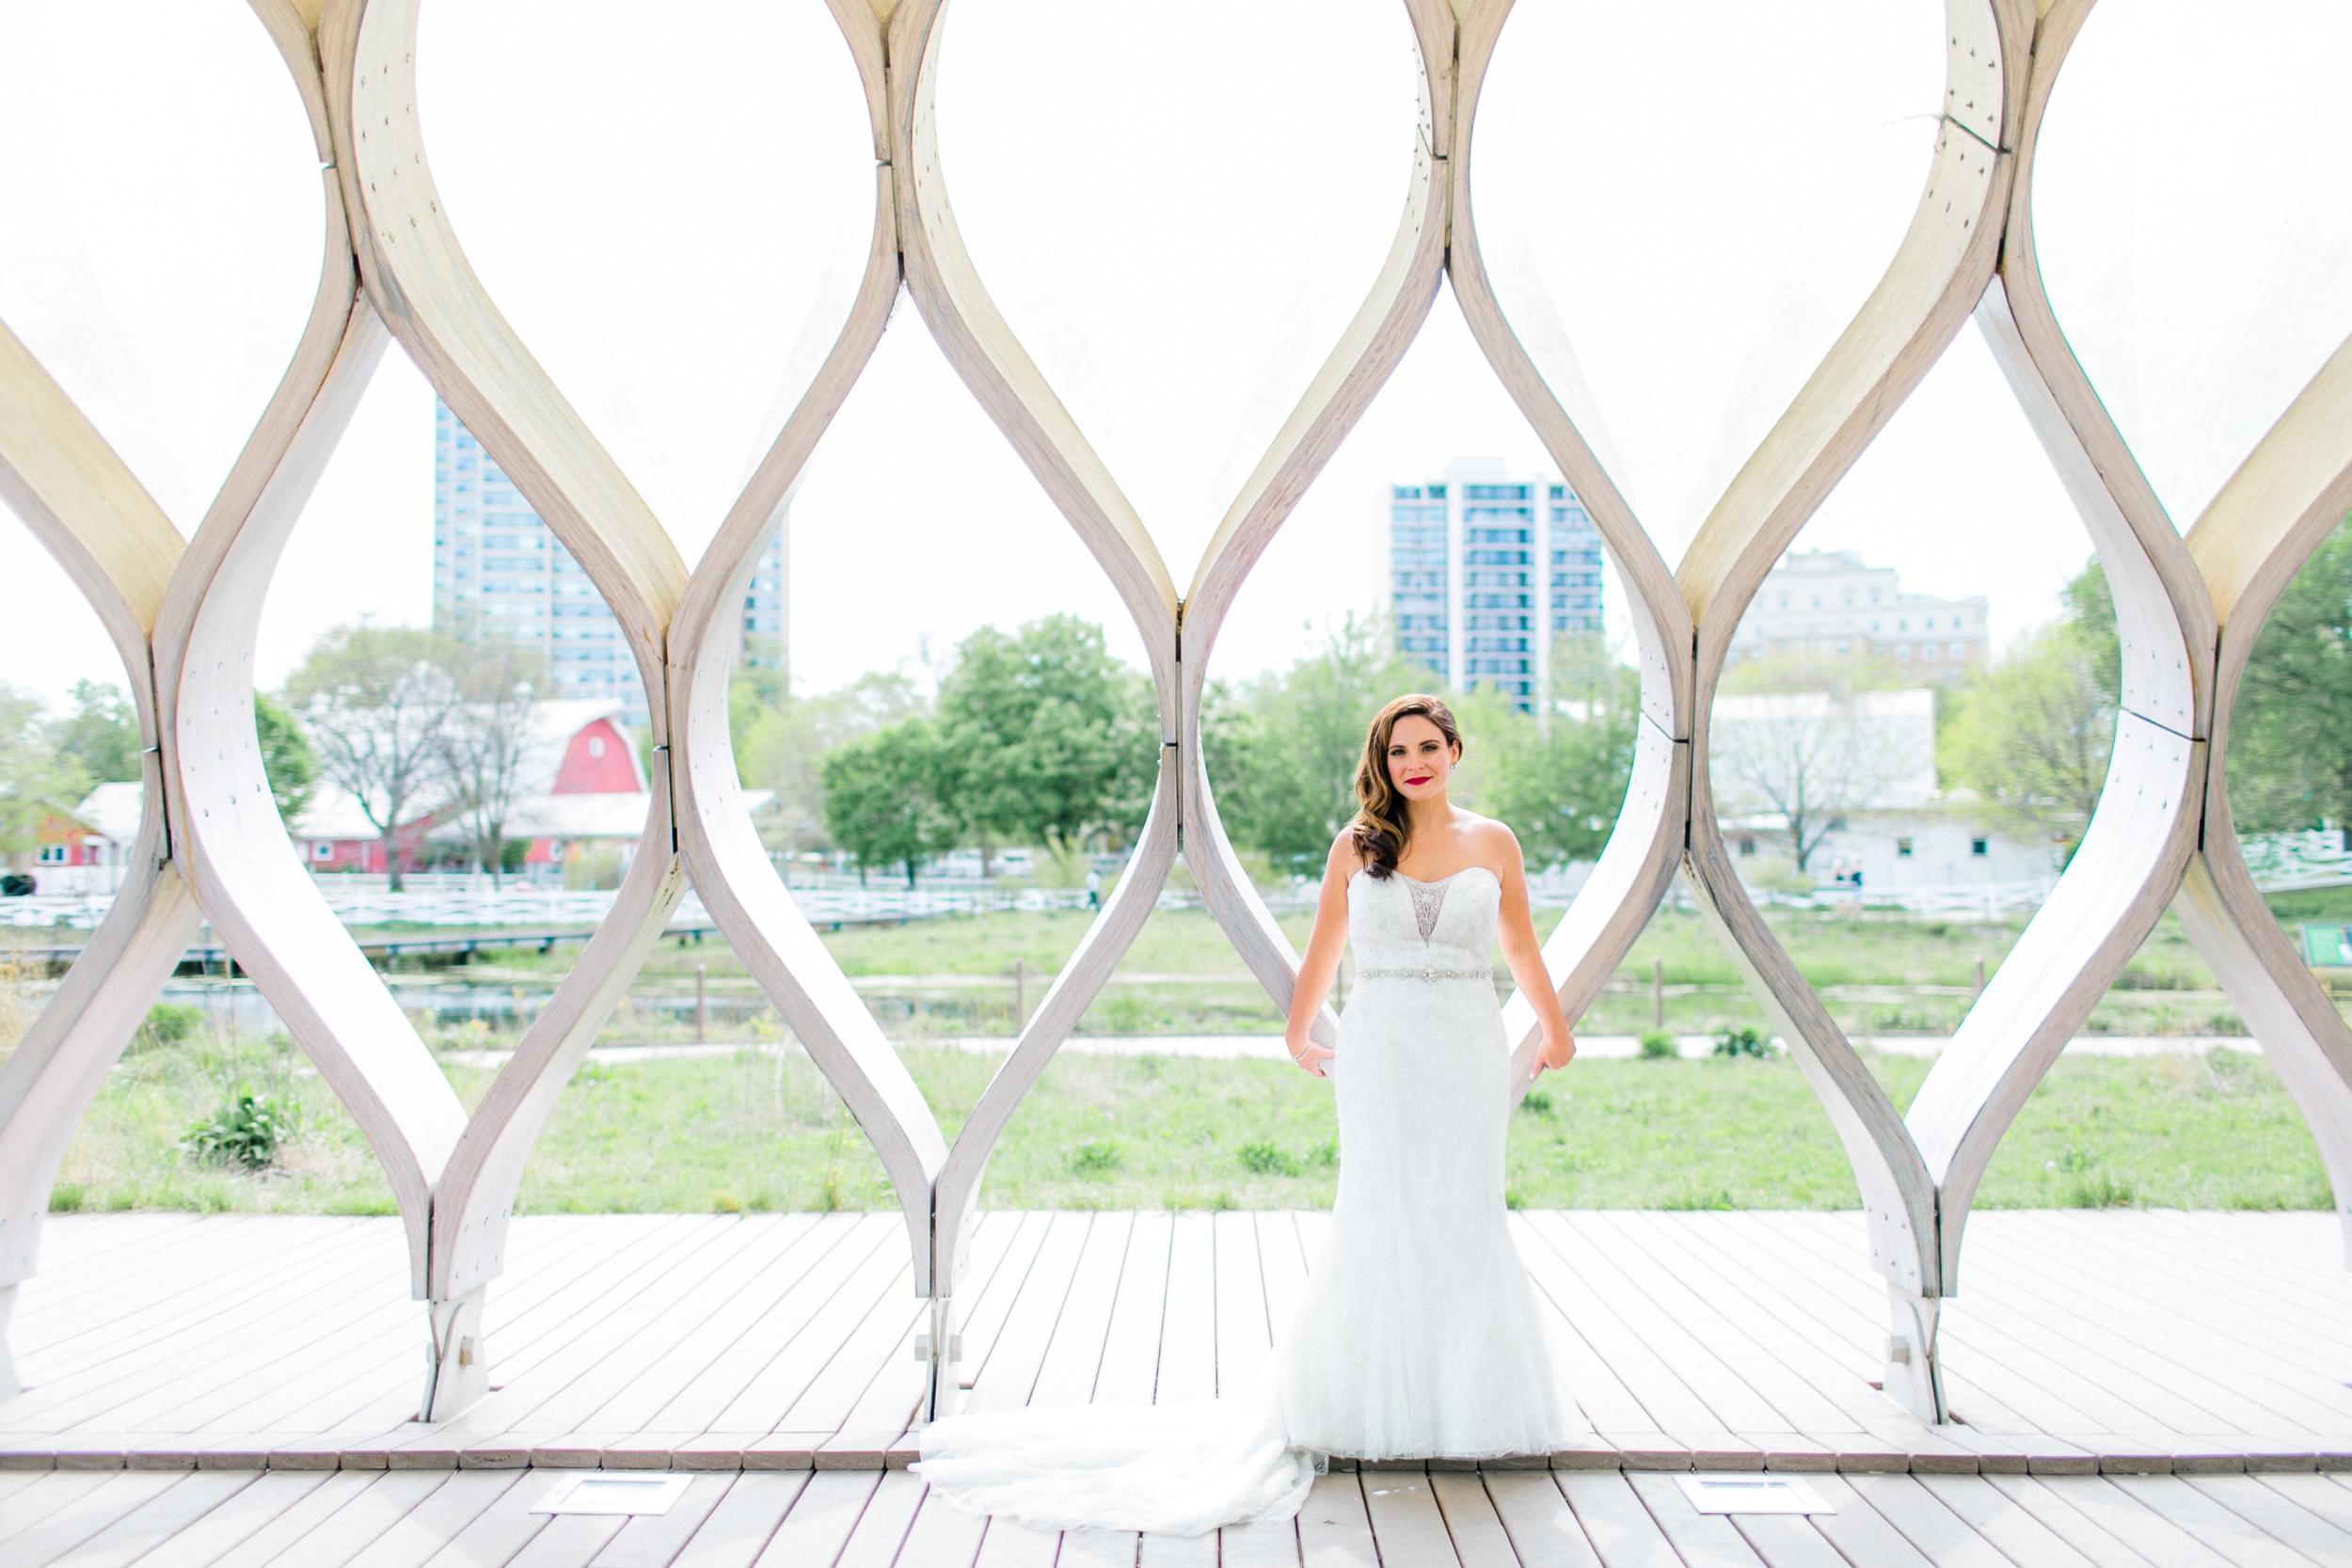 mayden_photography_weddings-69.jpg